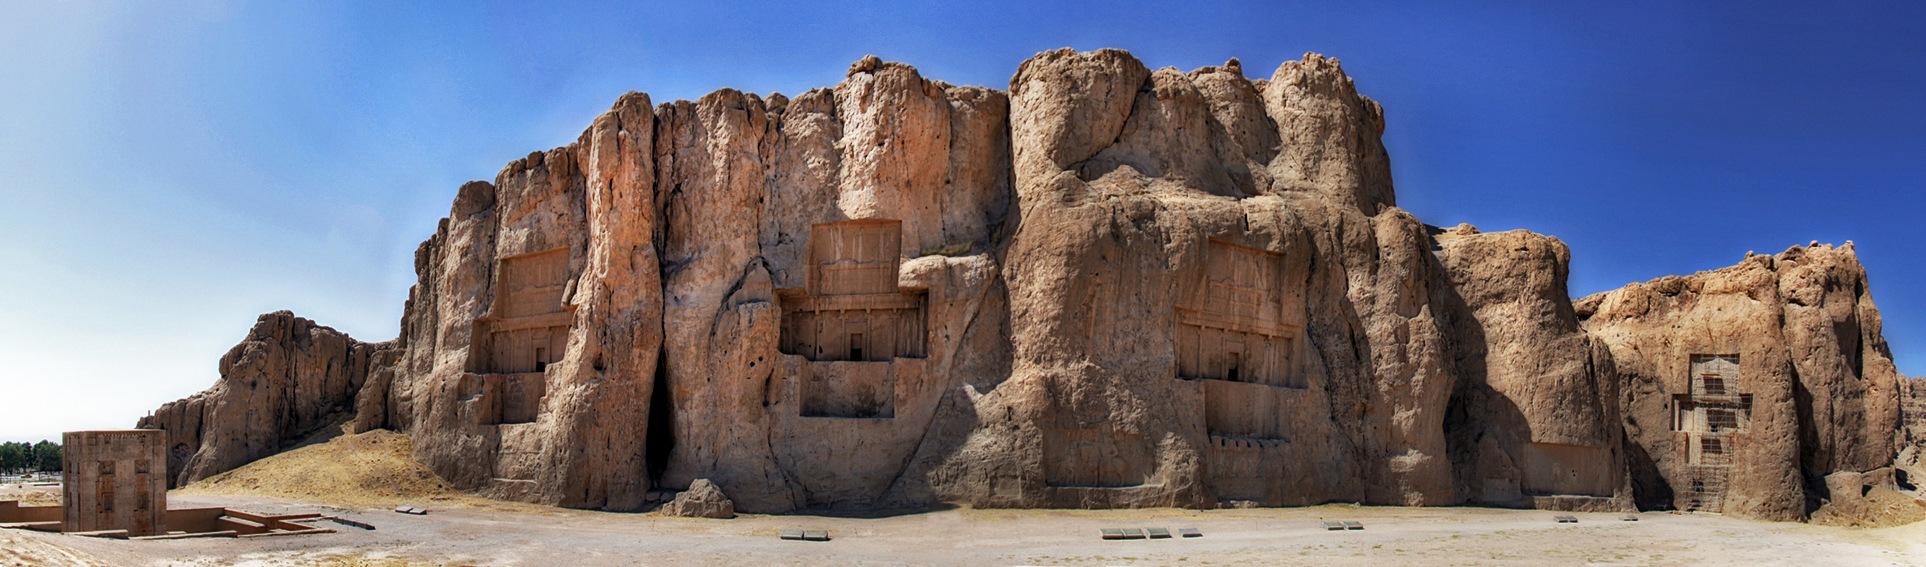 The place of the greatests by Shahabedin Alishahi